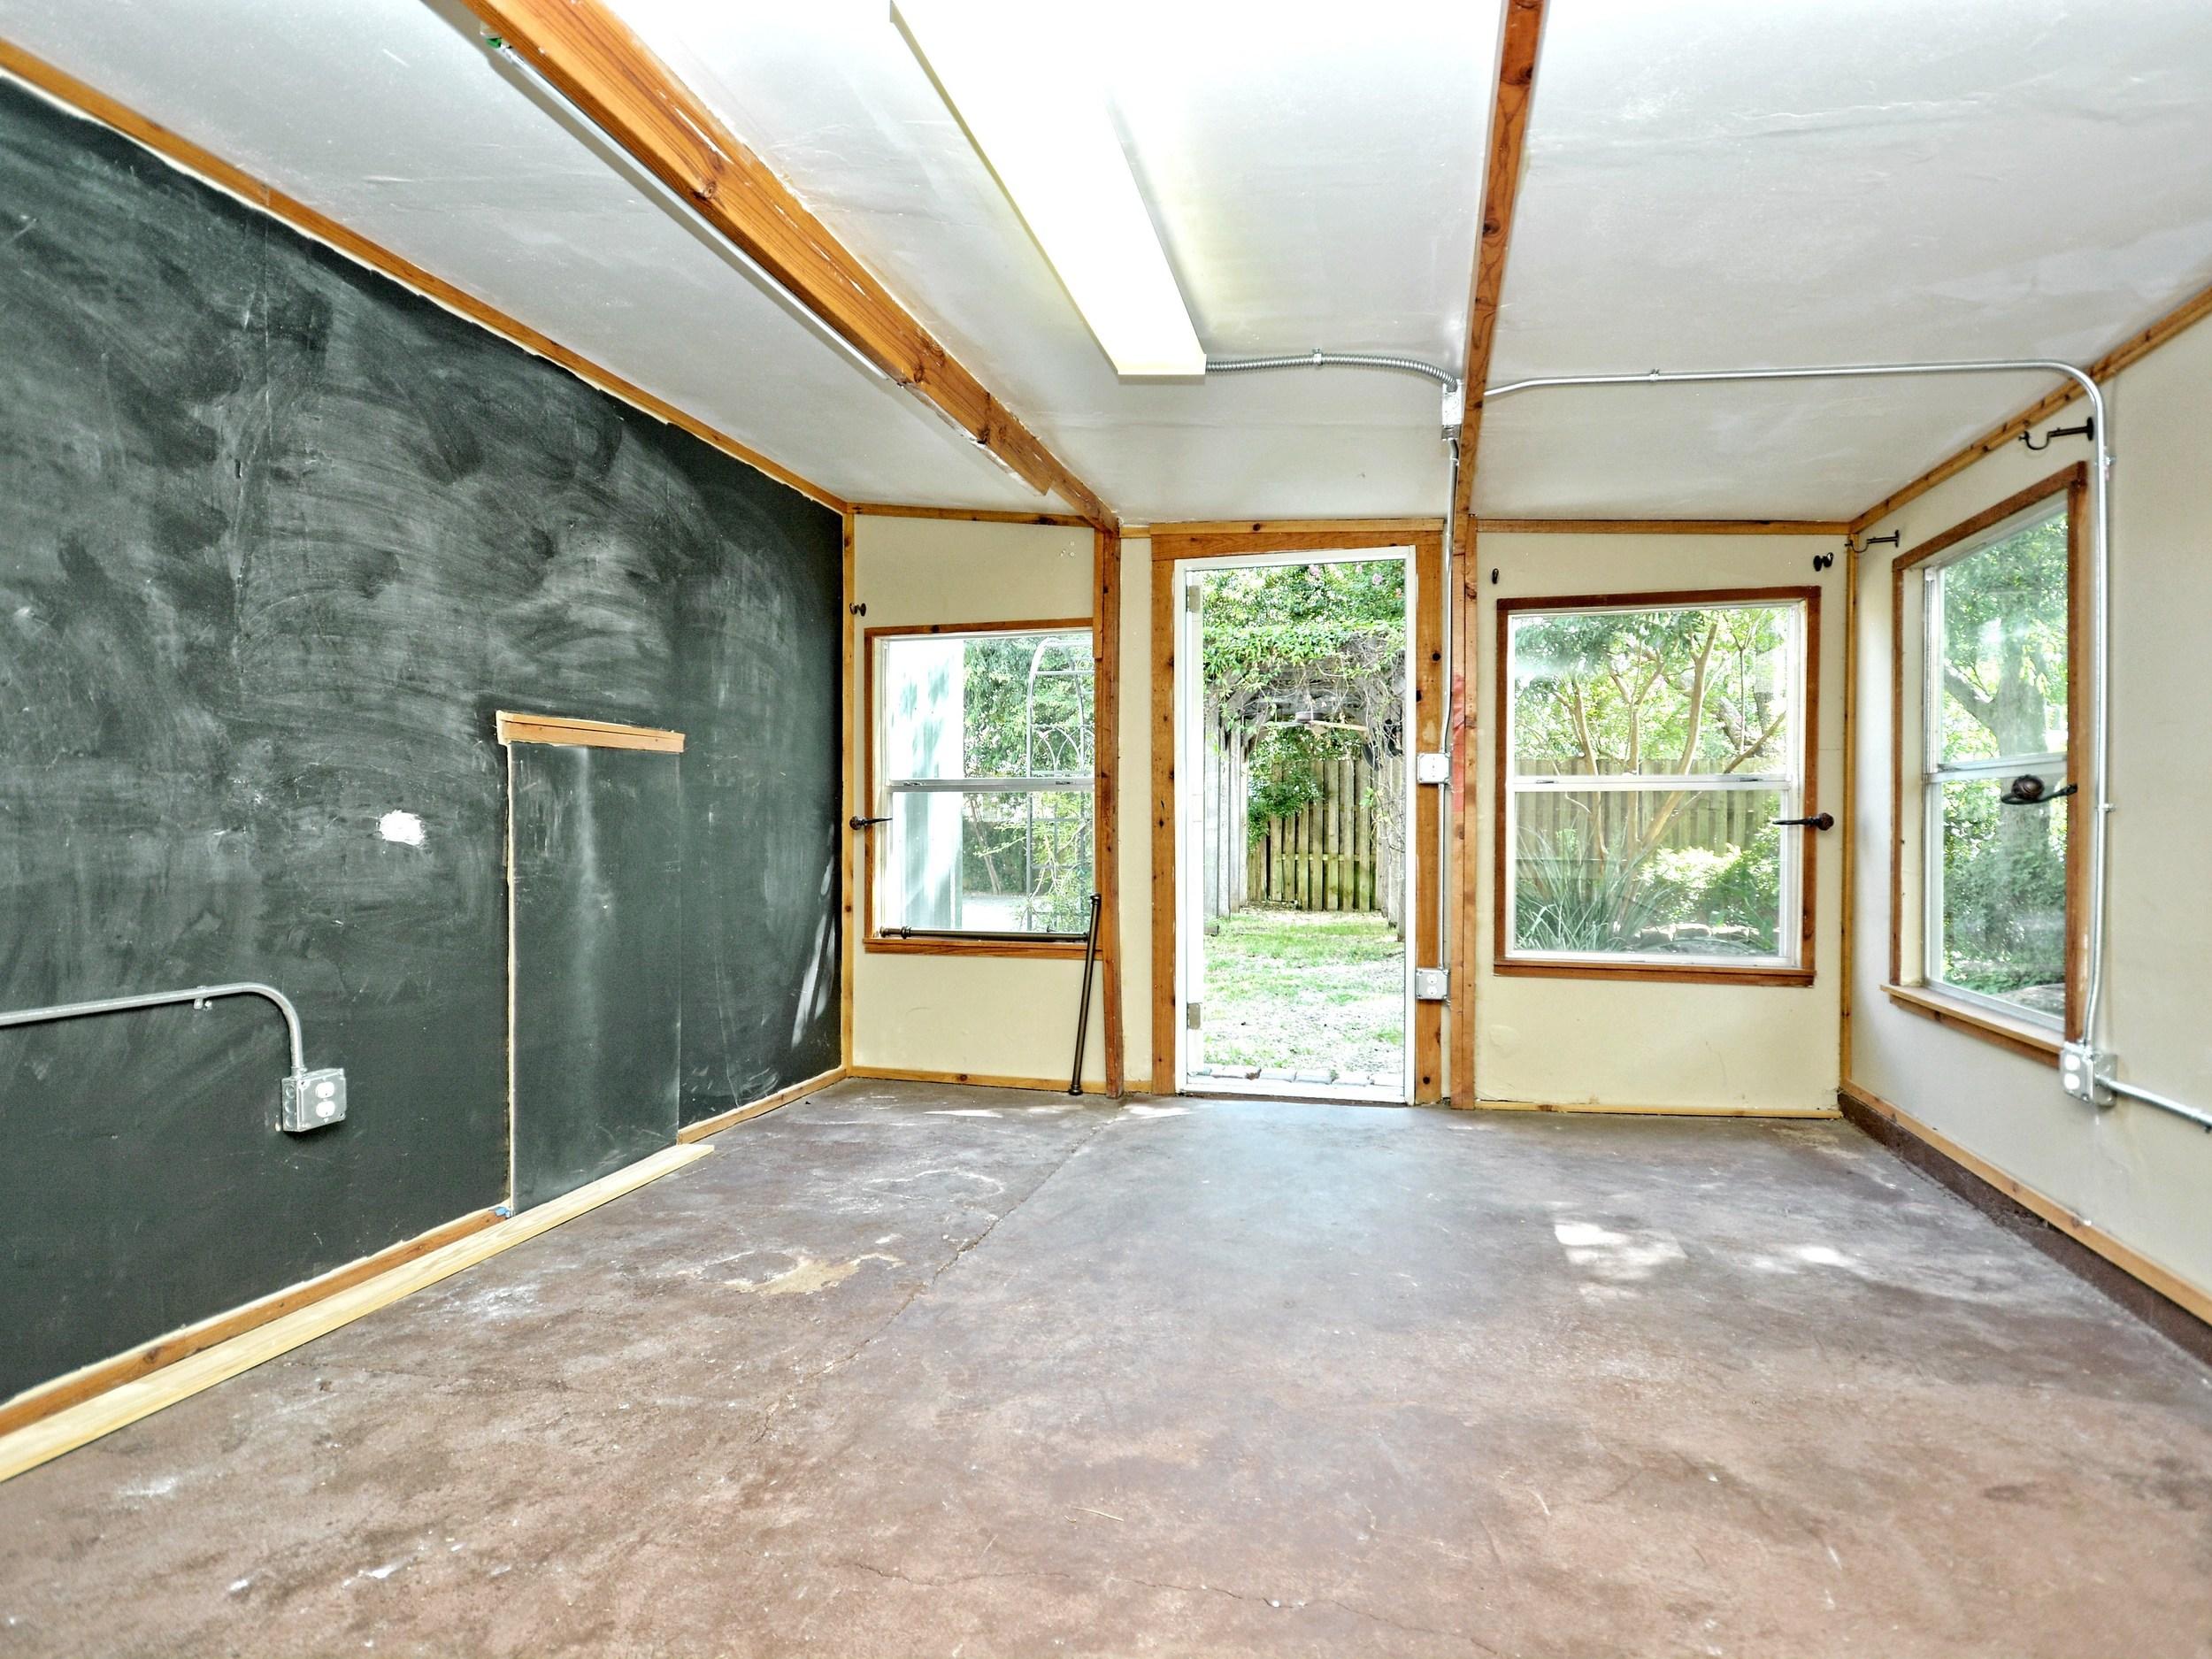 023_Studio Interior.jpg